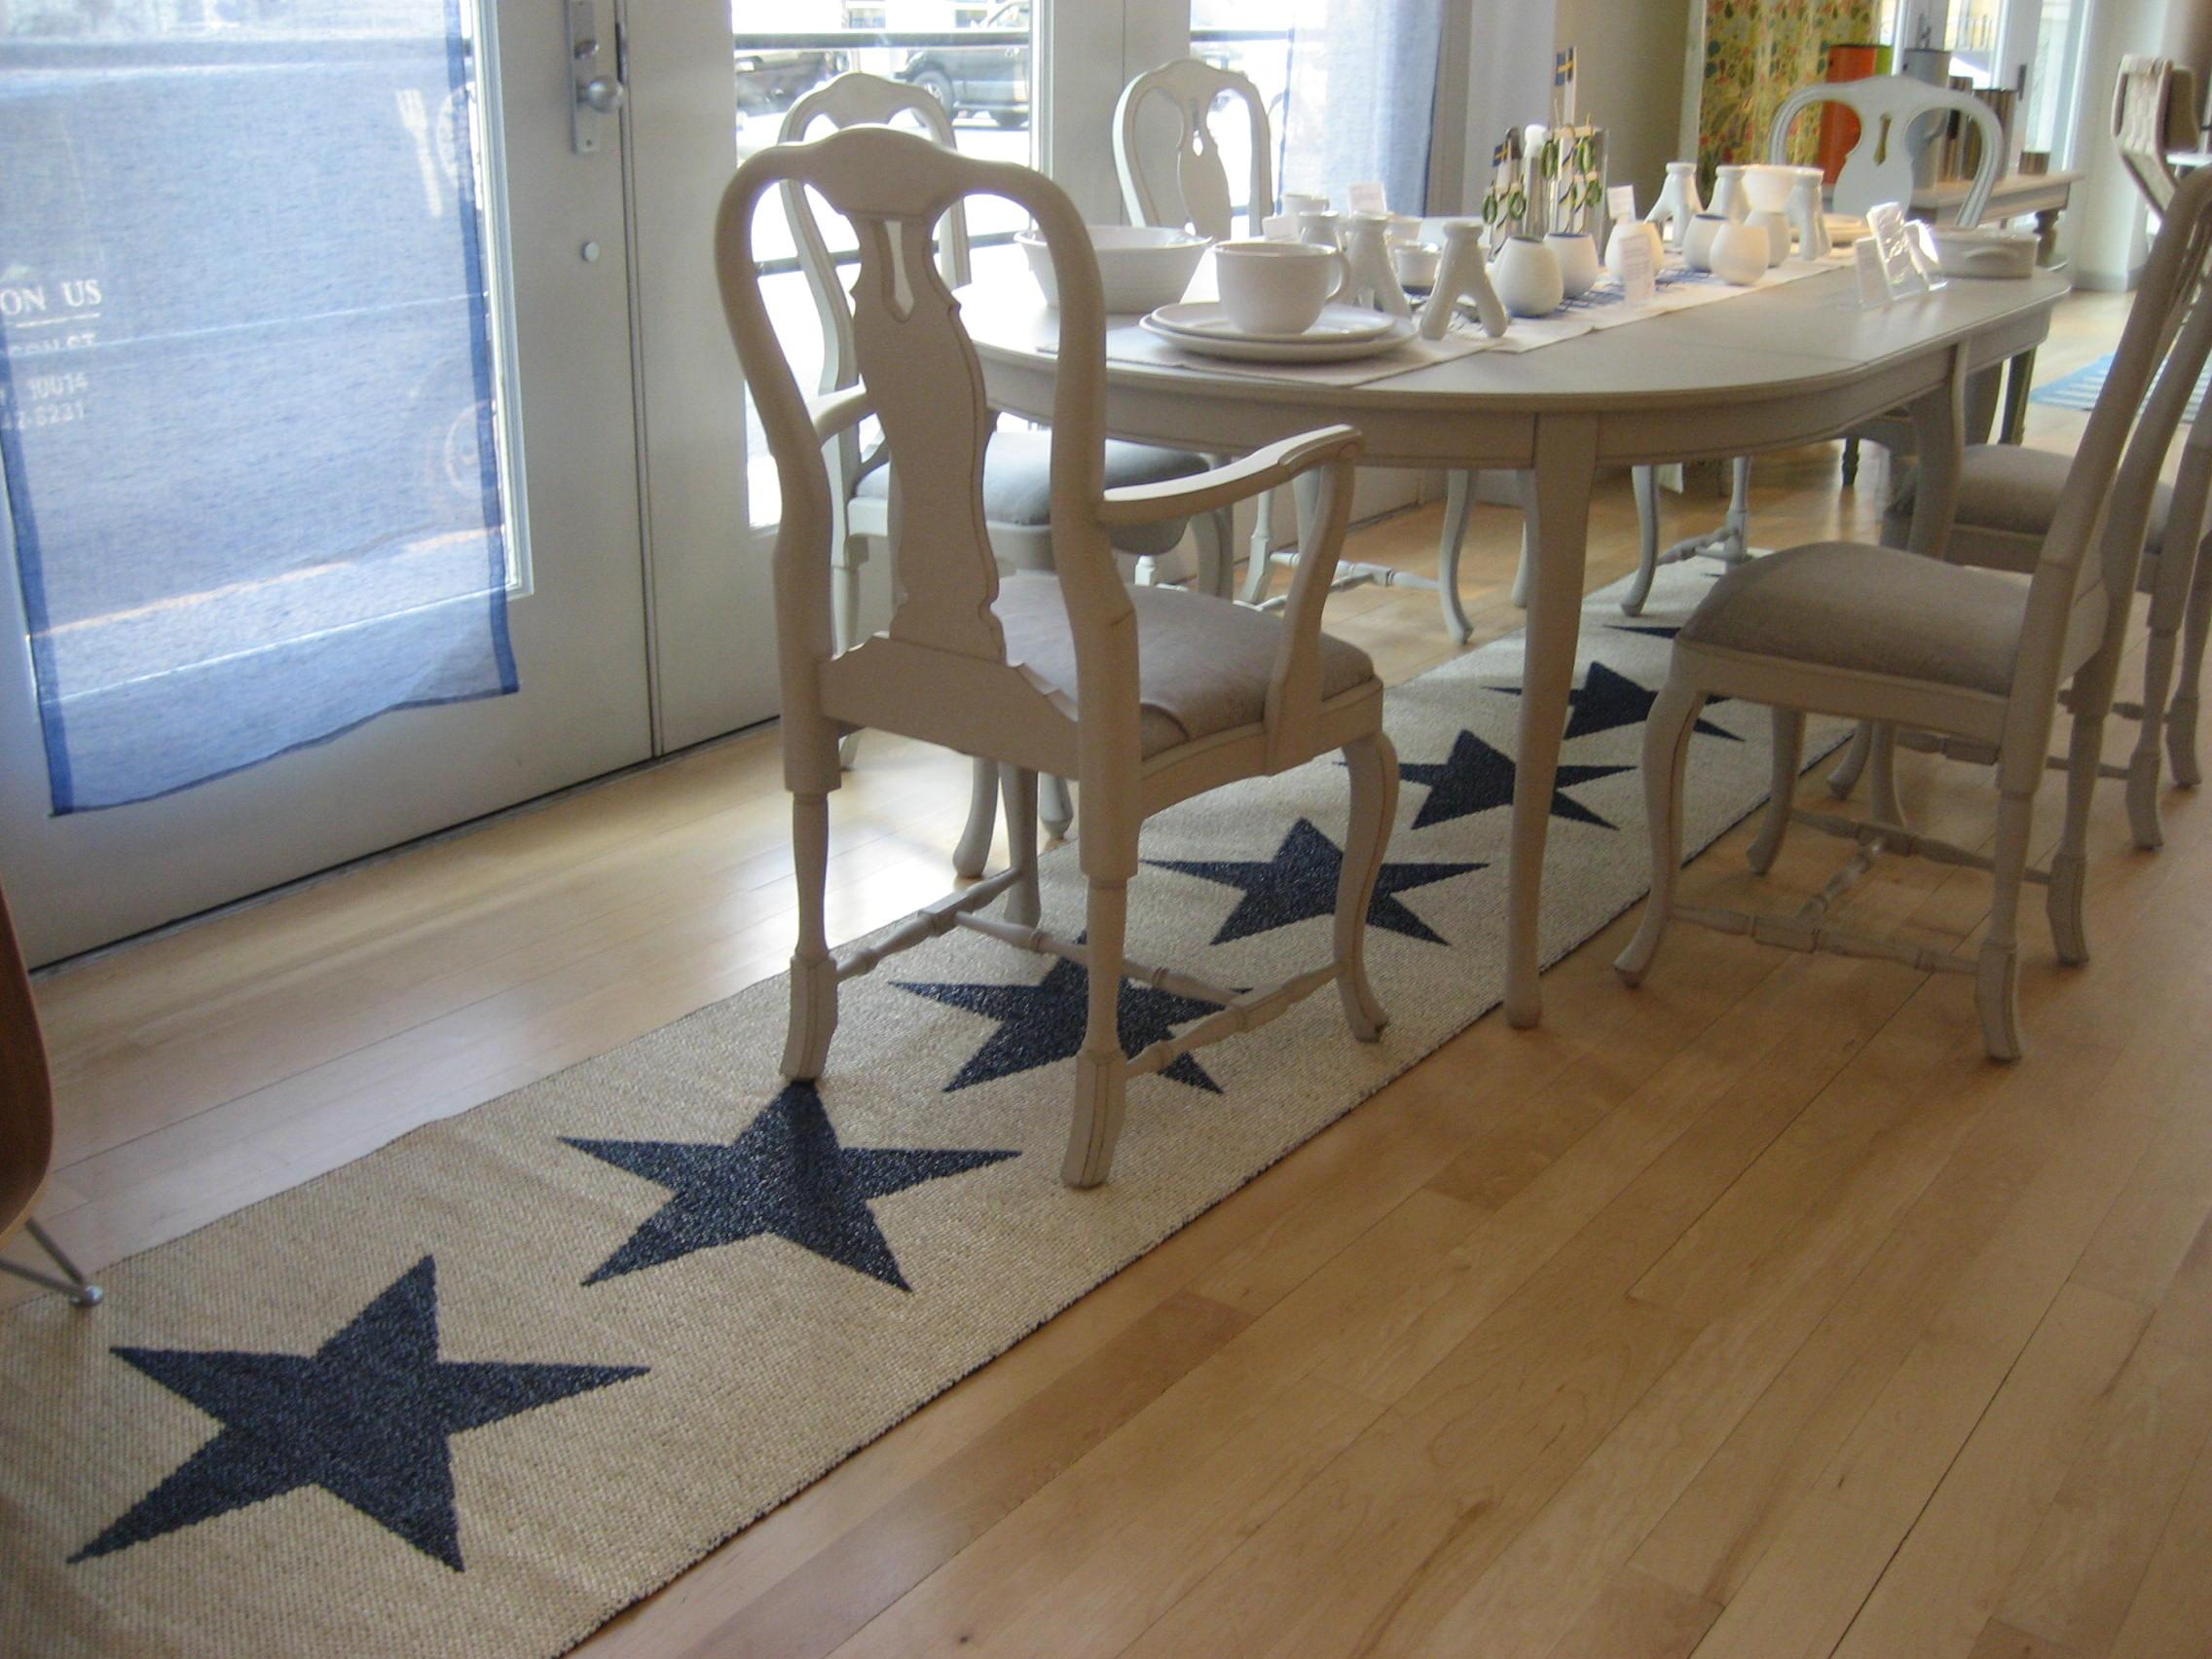 patterned woven plastic floor mat